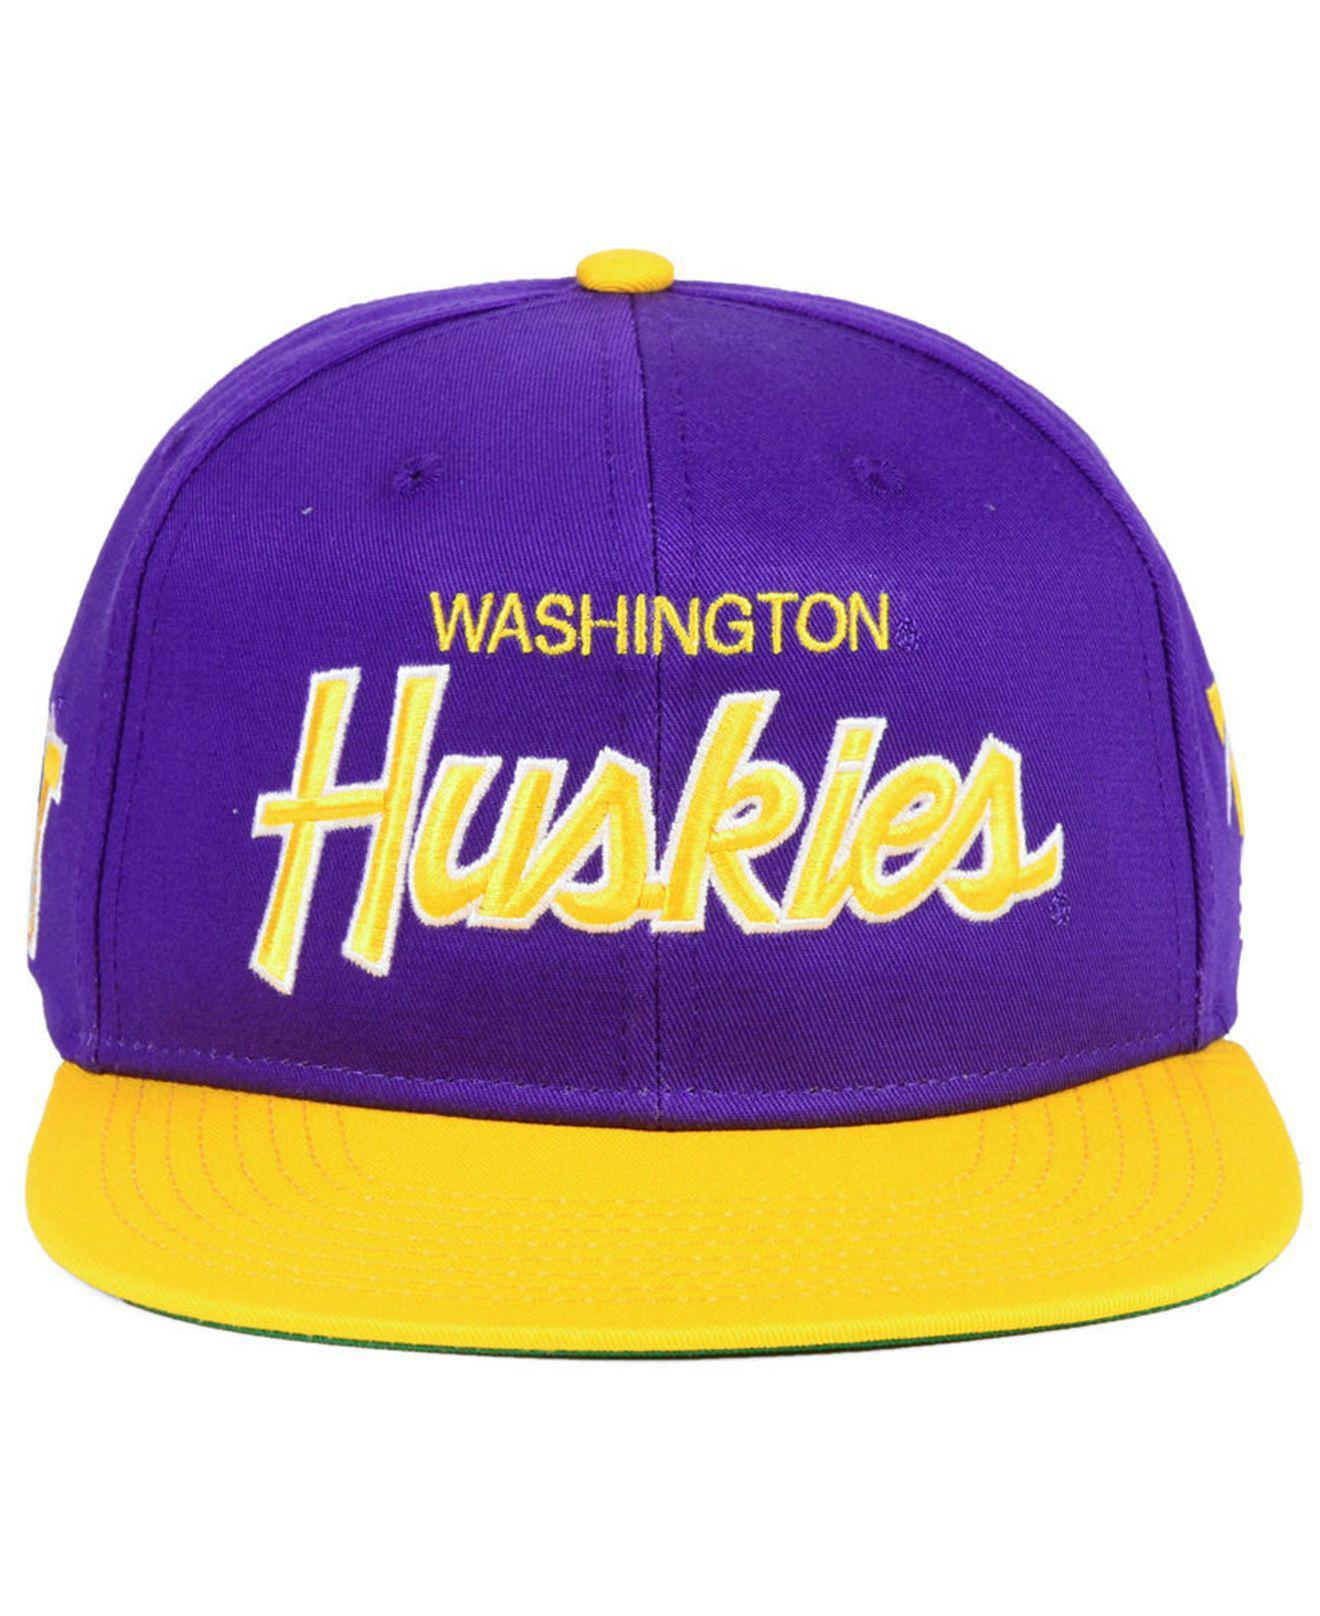 5676dc9a9 sweden washington huskies nike ncaa sport specialties snapback cap ...